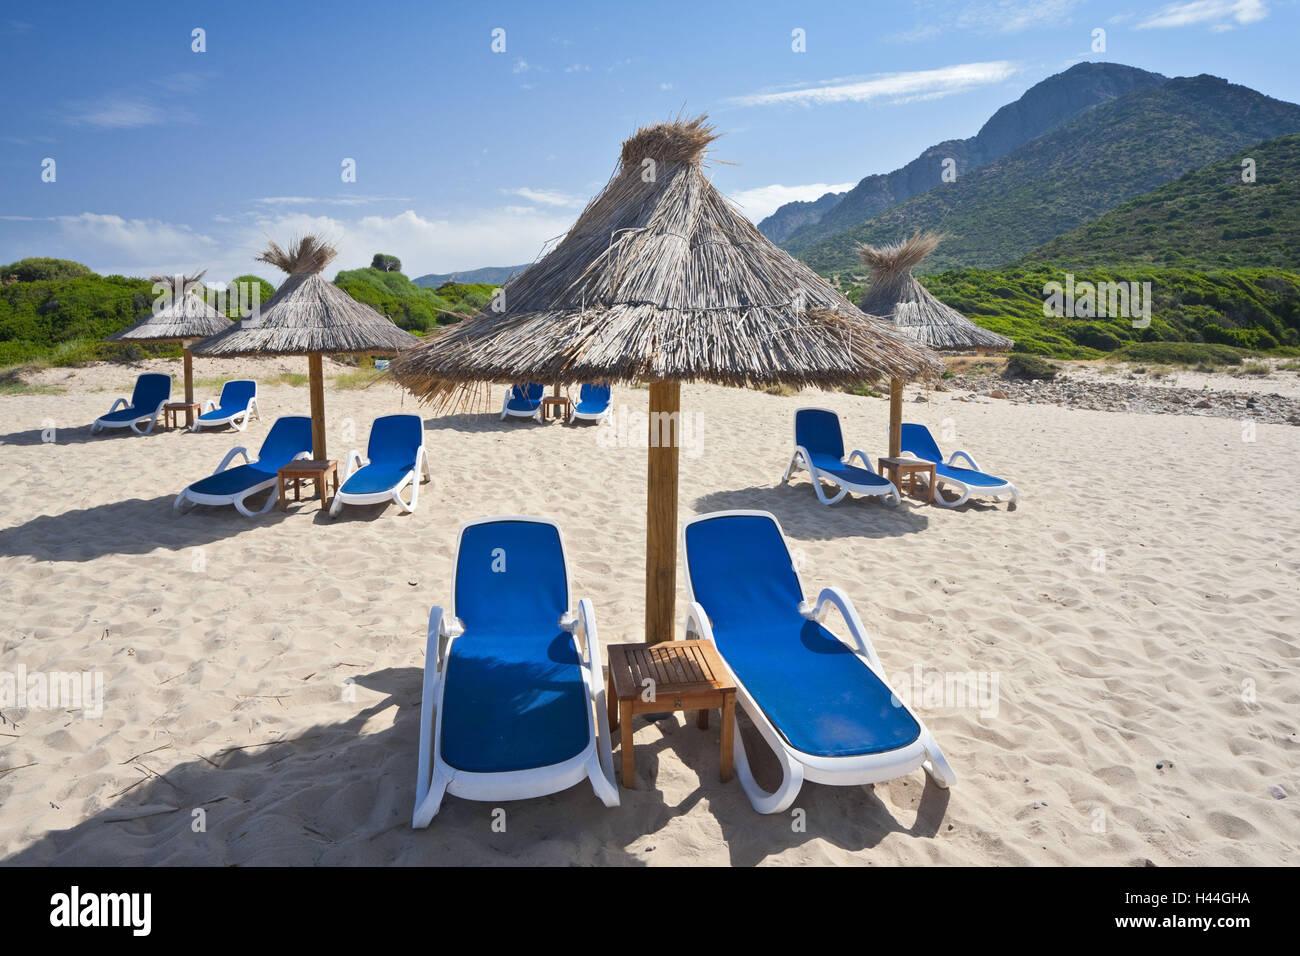 France, Corsica, beach, Capu Rossu, pest d'Arone, deck chairs, display screens, - Stock Image